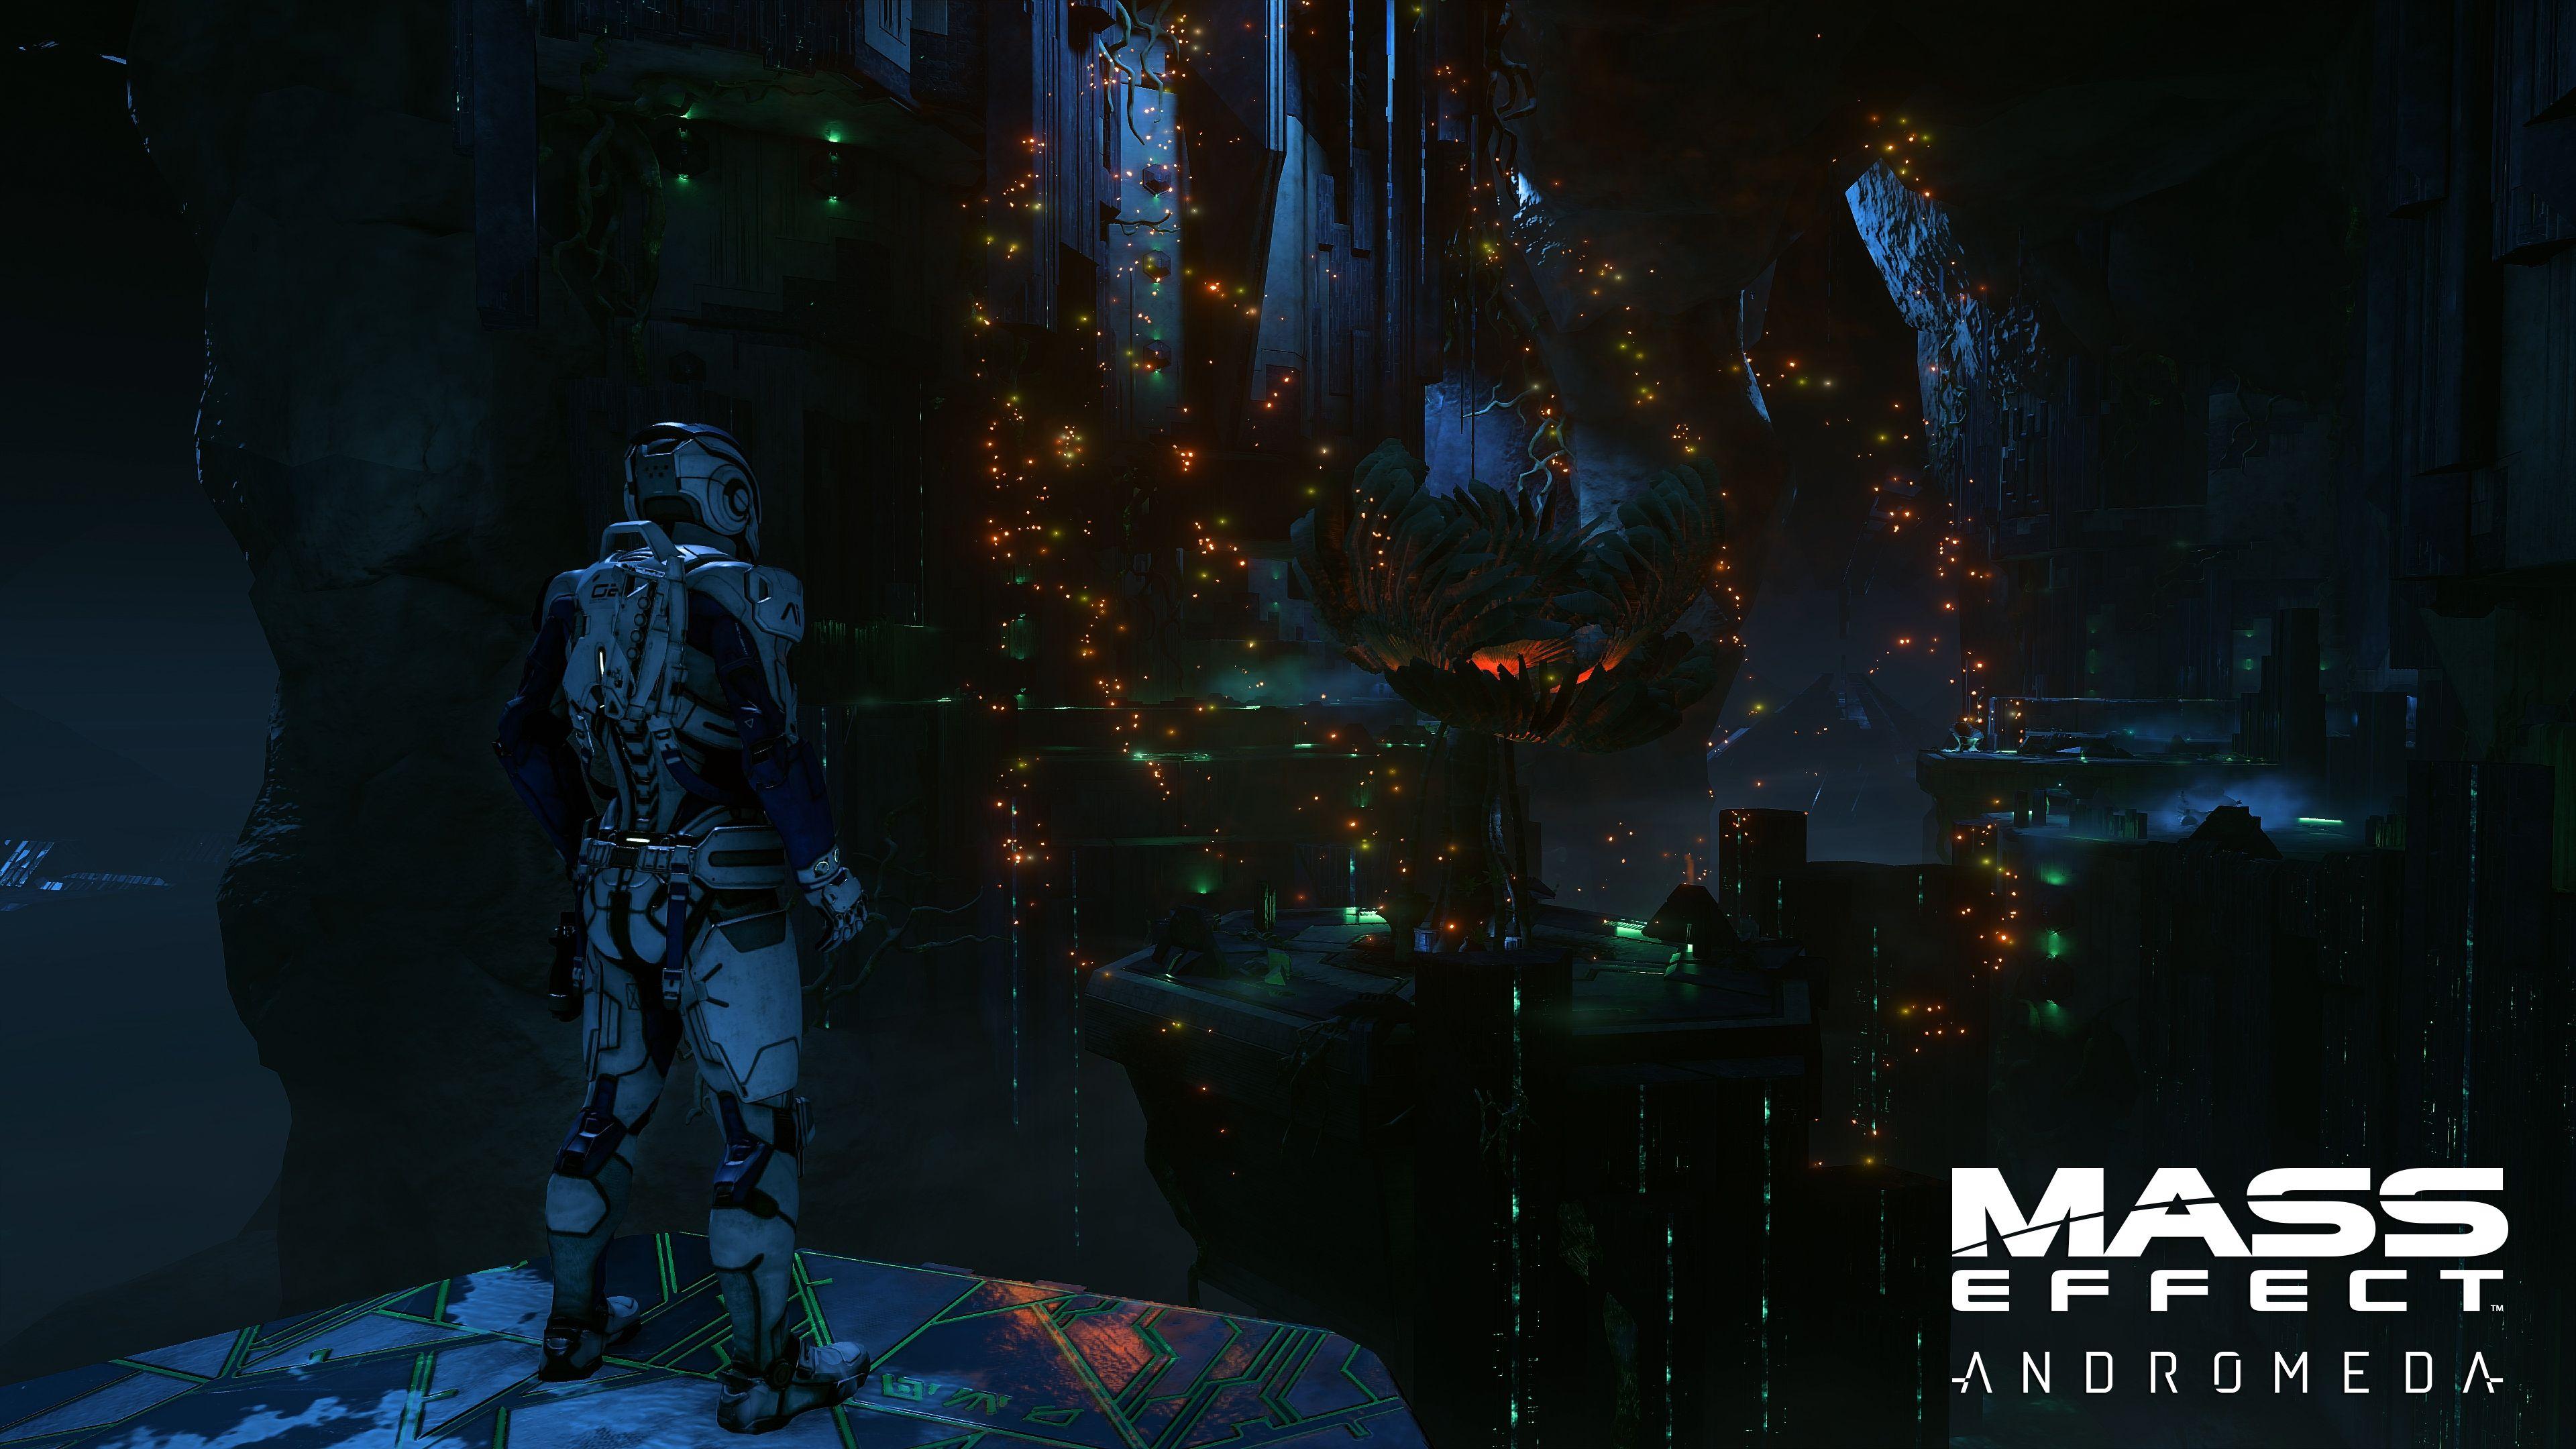 Mass Effect Andromeda (PC) - 7